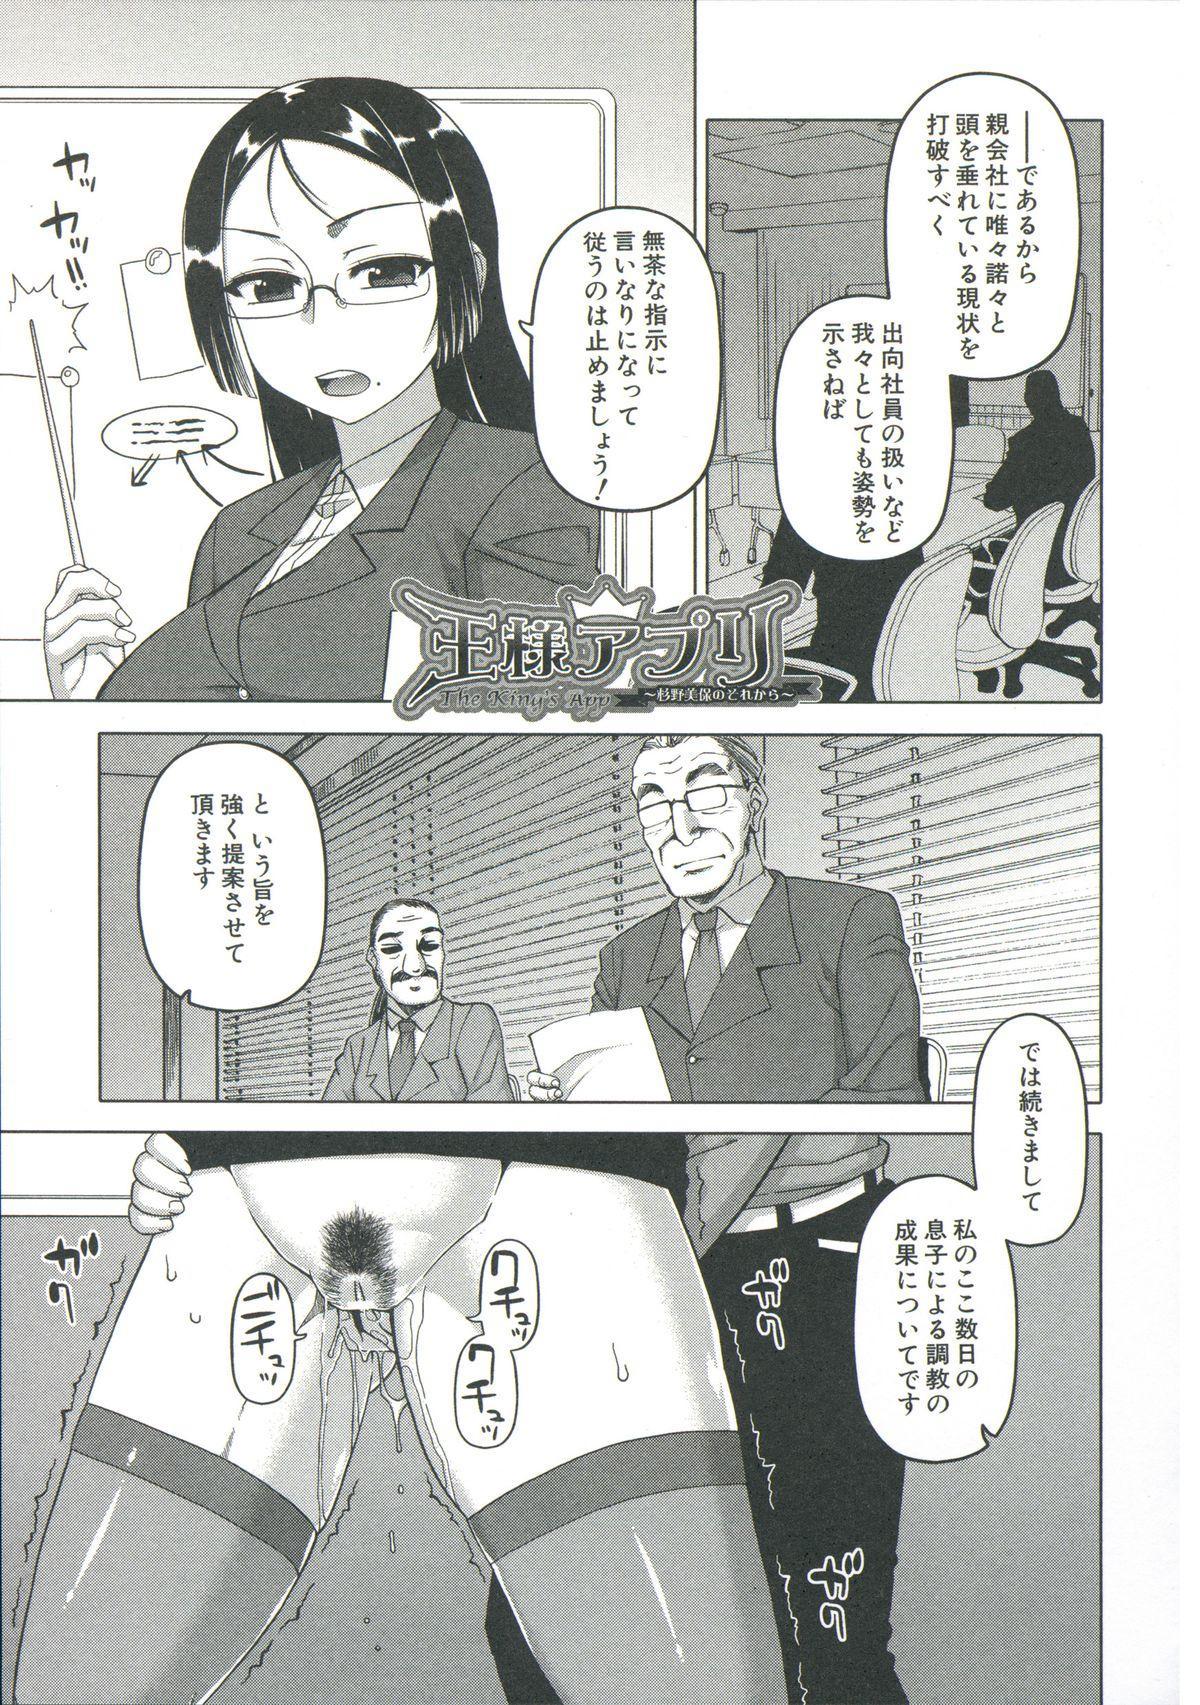 [Takatsu] Ou-sama Appli - King App 37